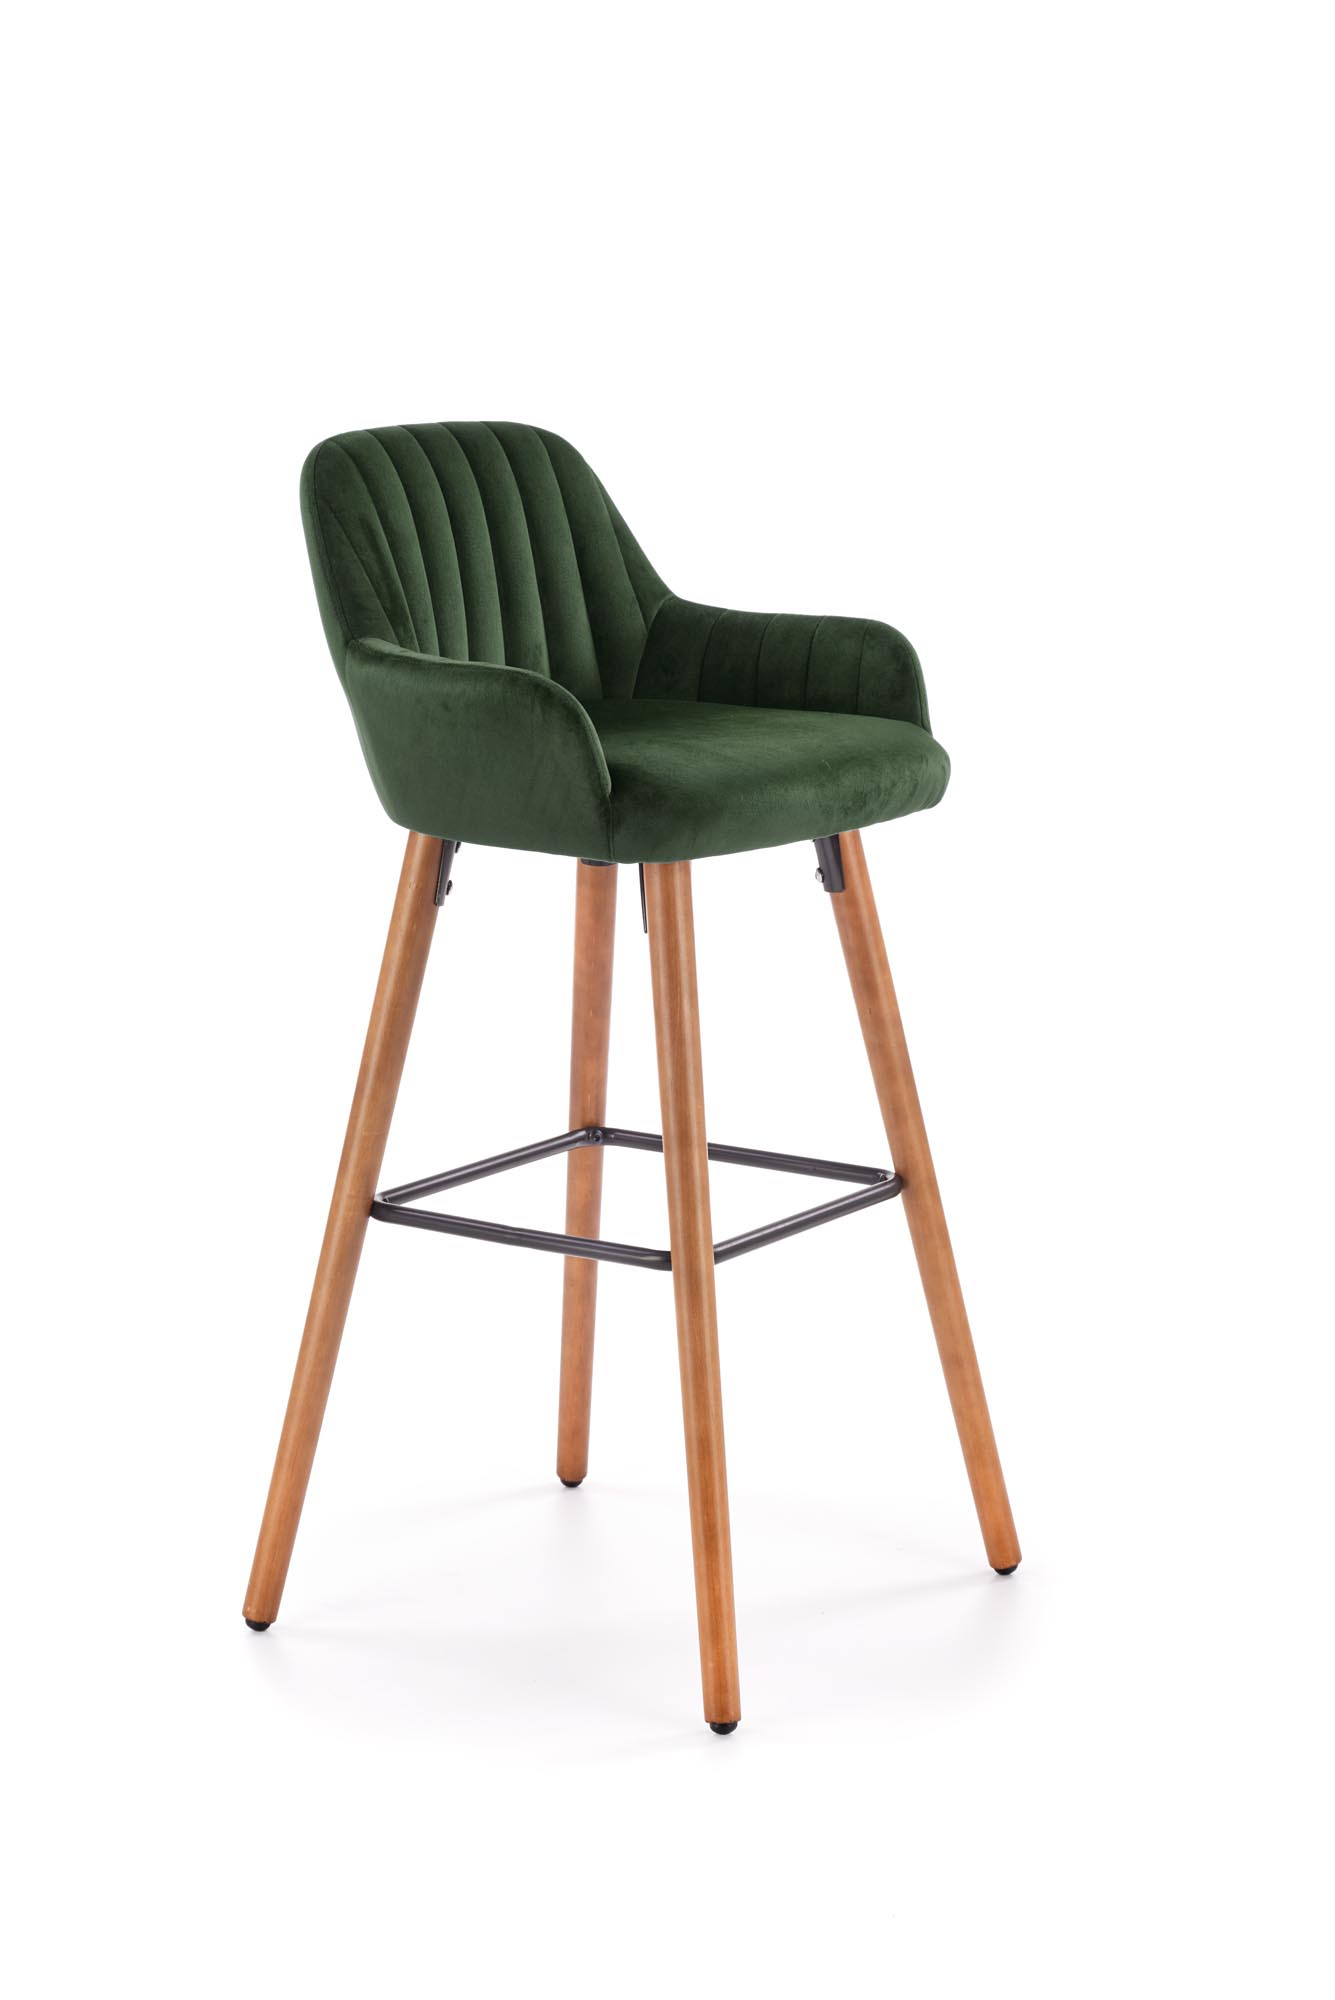 H93 hoker nogi - orzech, tapicerka - c. zielony